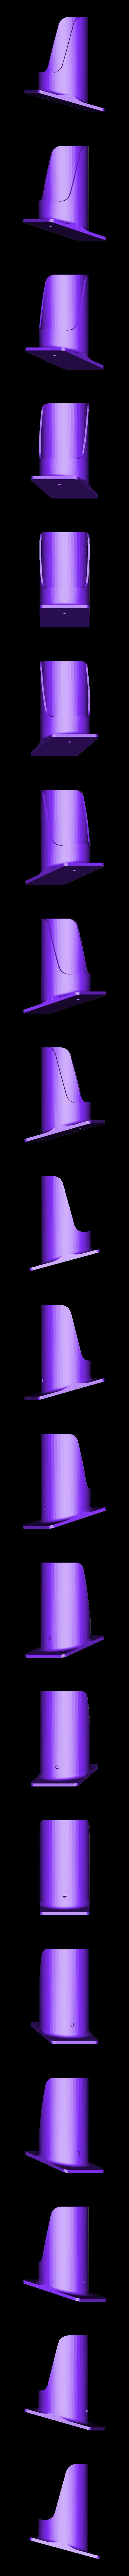 Spice_Holder_v2.STL Download free STL file Ikea Spice Jar Holder - ÖRTFYLLD • Model to 3D print, DIYMachines